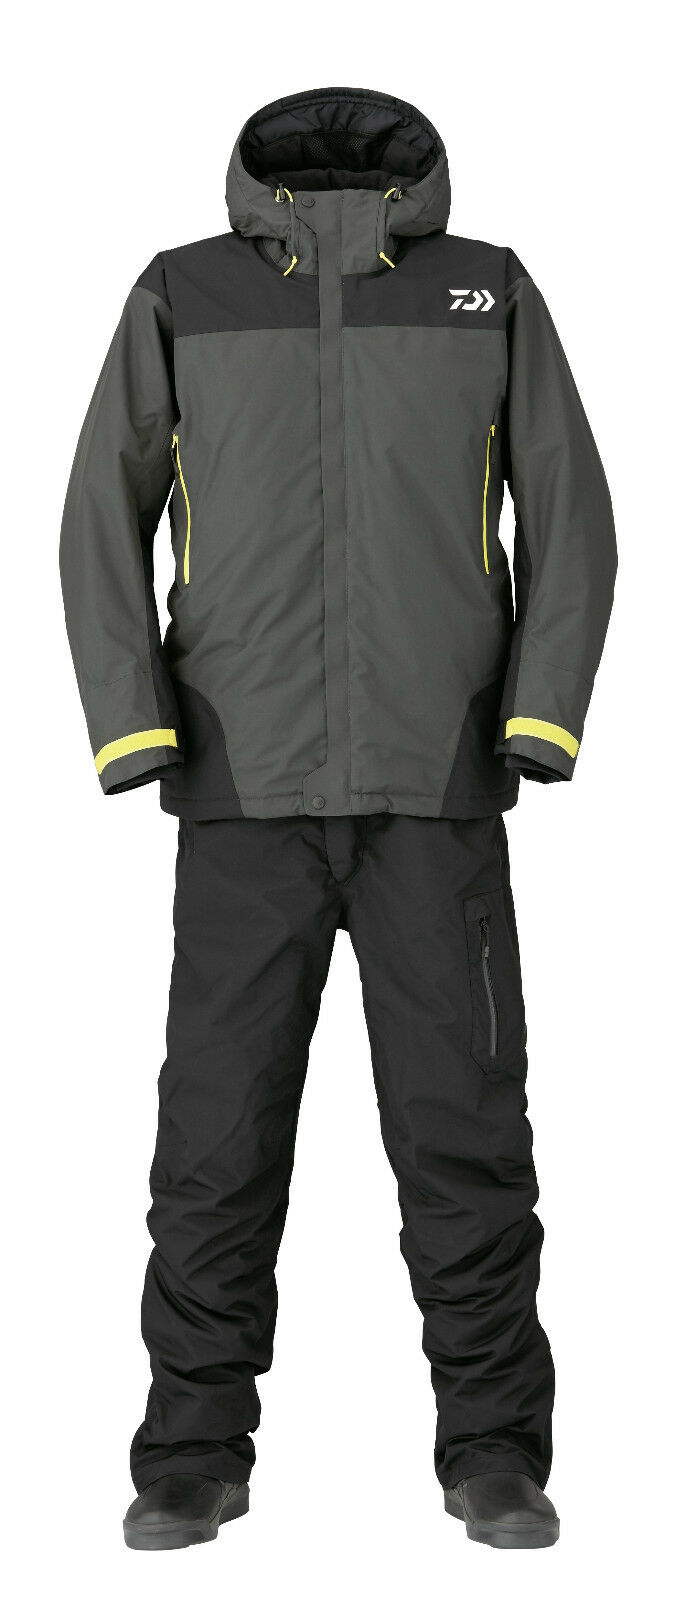 Daiwa Rainmax Winter Suit DW-3206 Winteranzug Thermo Anzug f. Winter